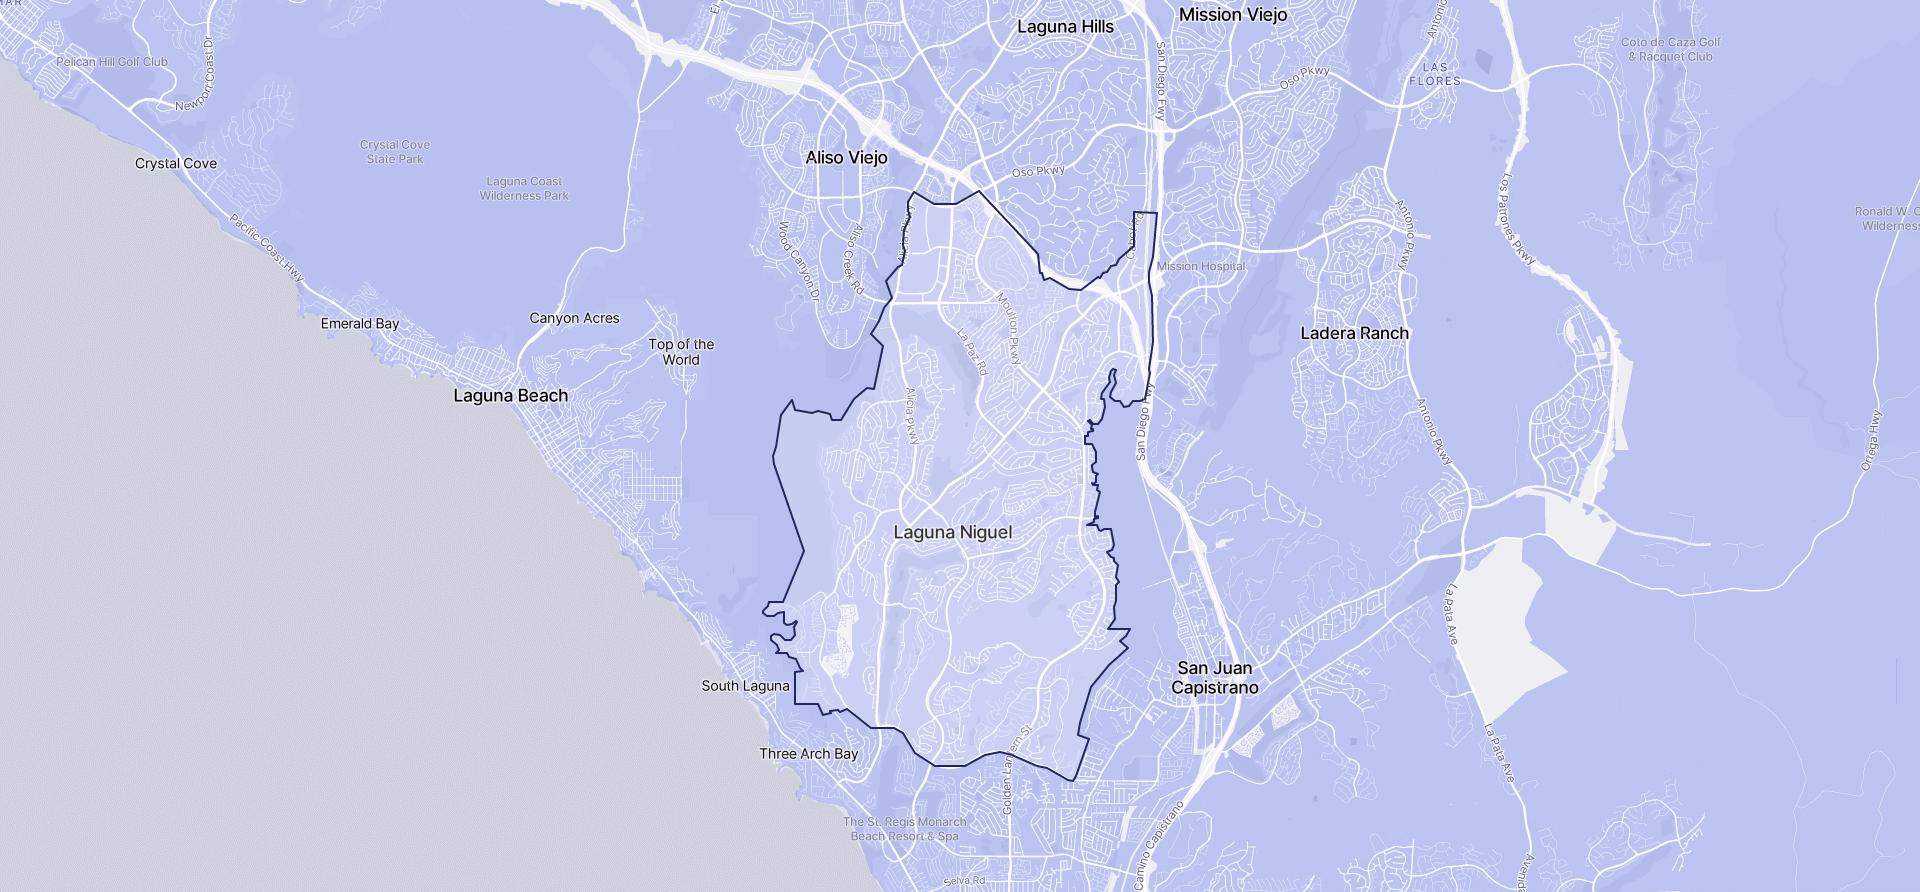 Image of Laguna Niguel boundaries on a map.